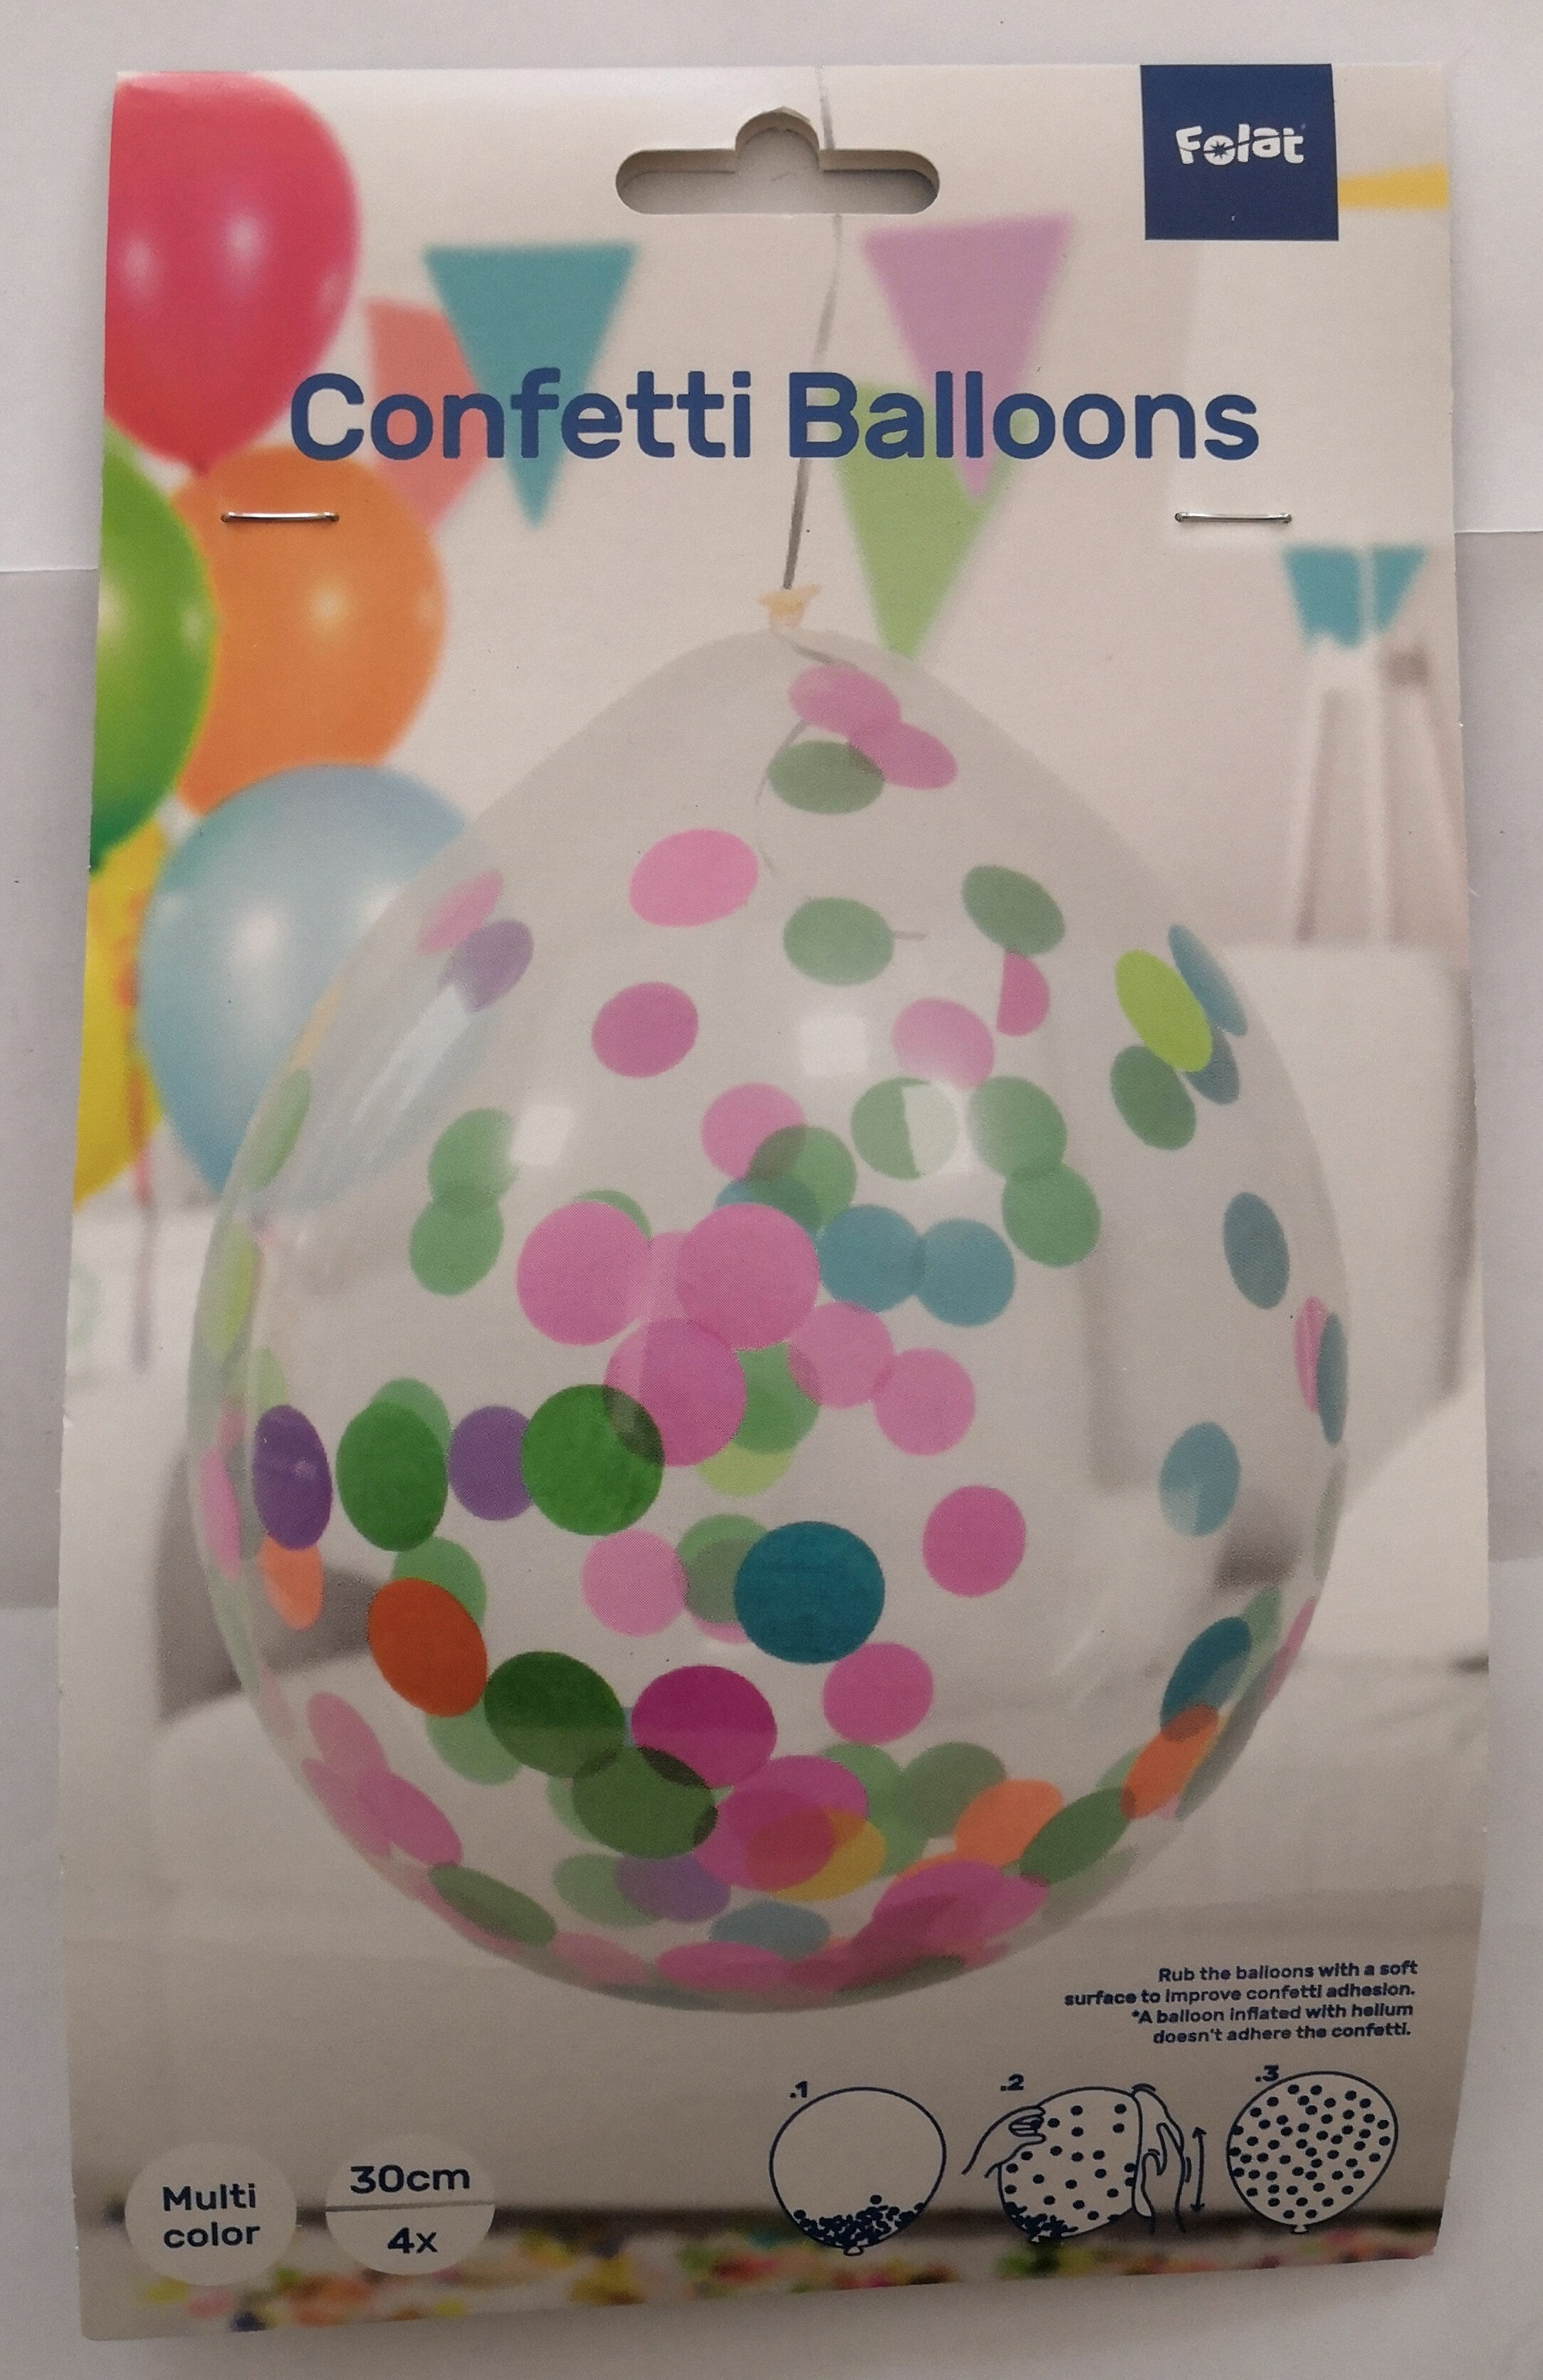 Confetti Balloons - Product - de